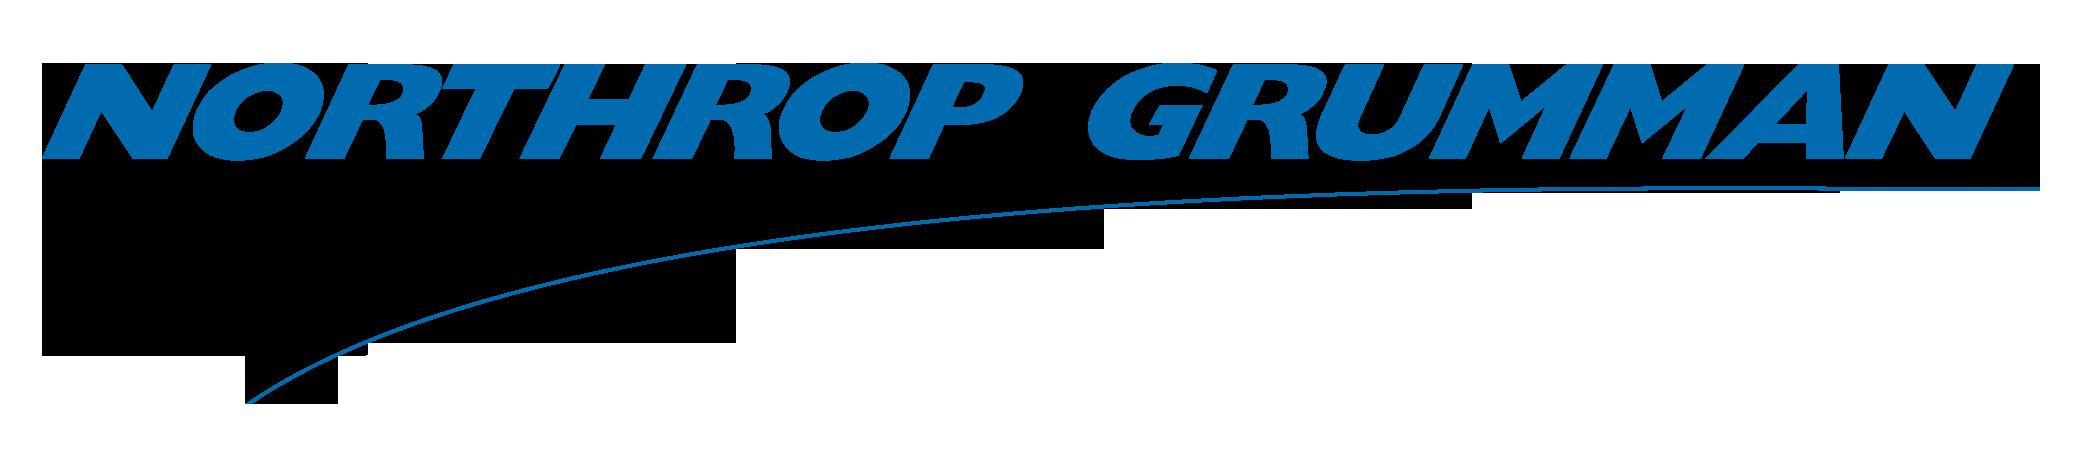 NorthropGrumman_Transparent